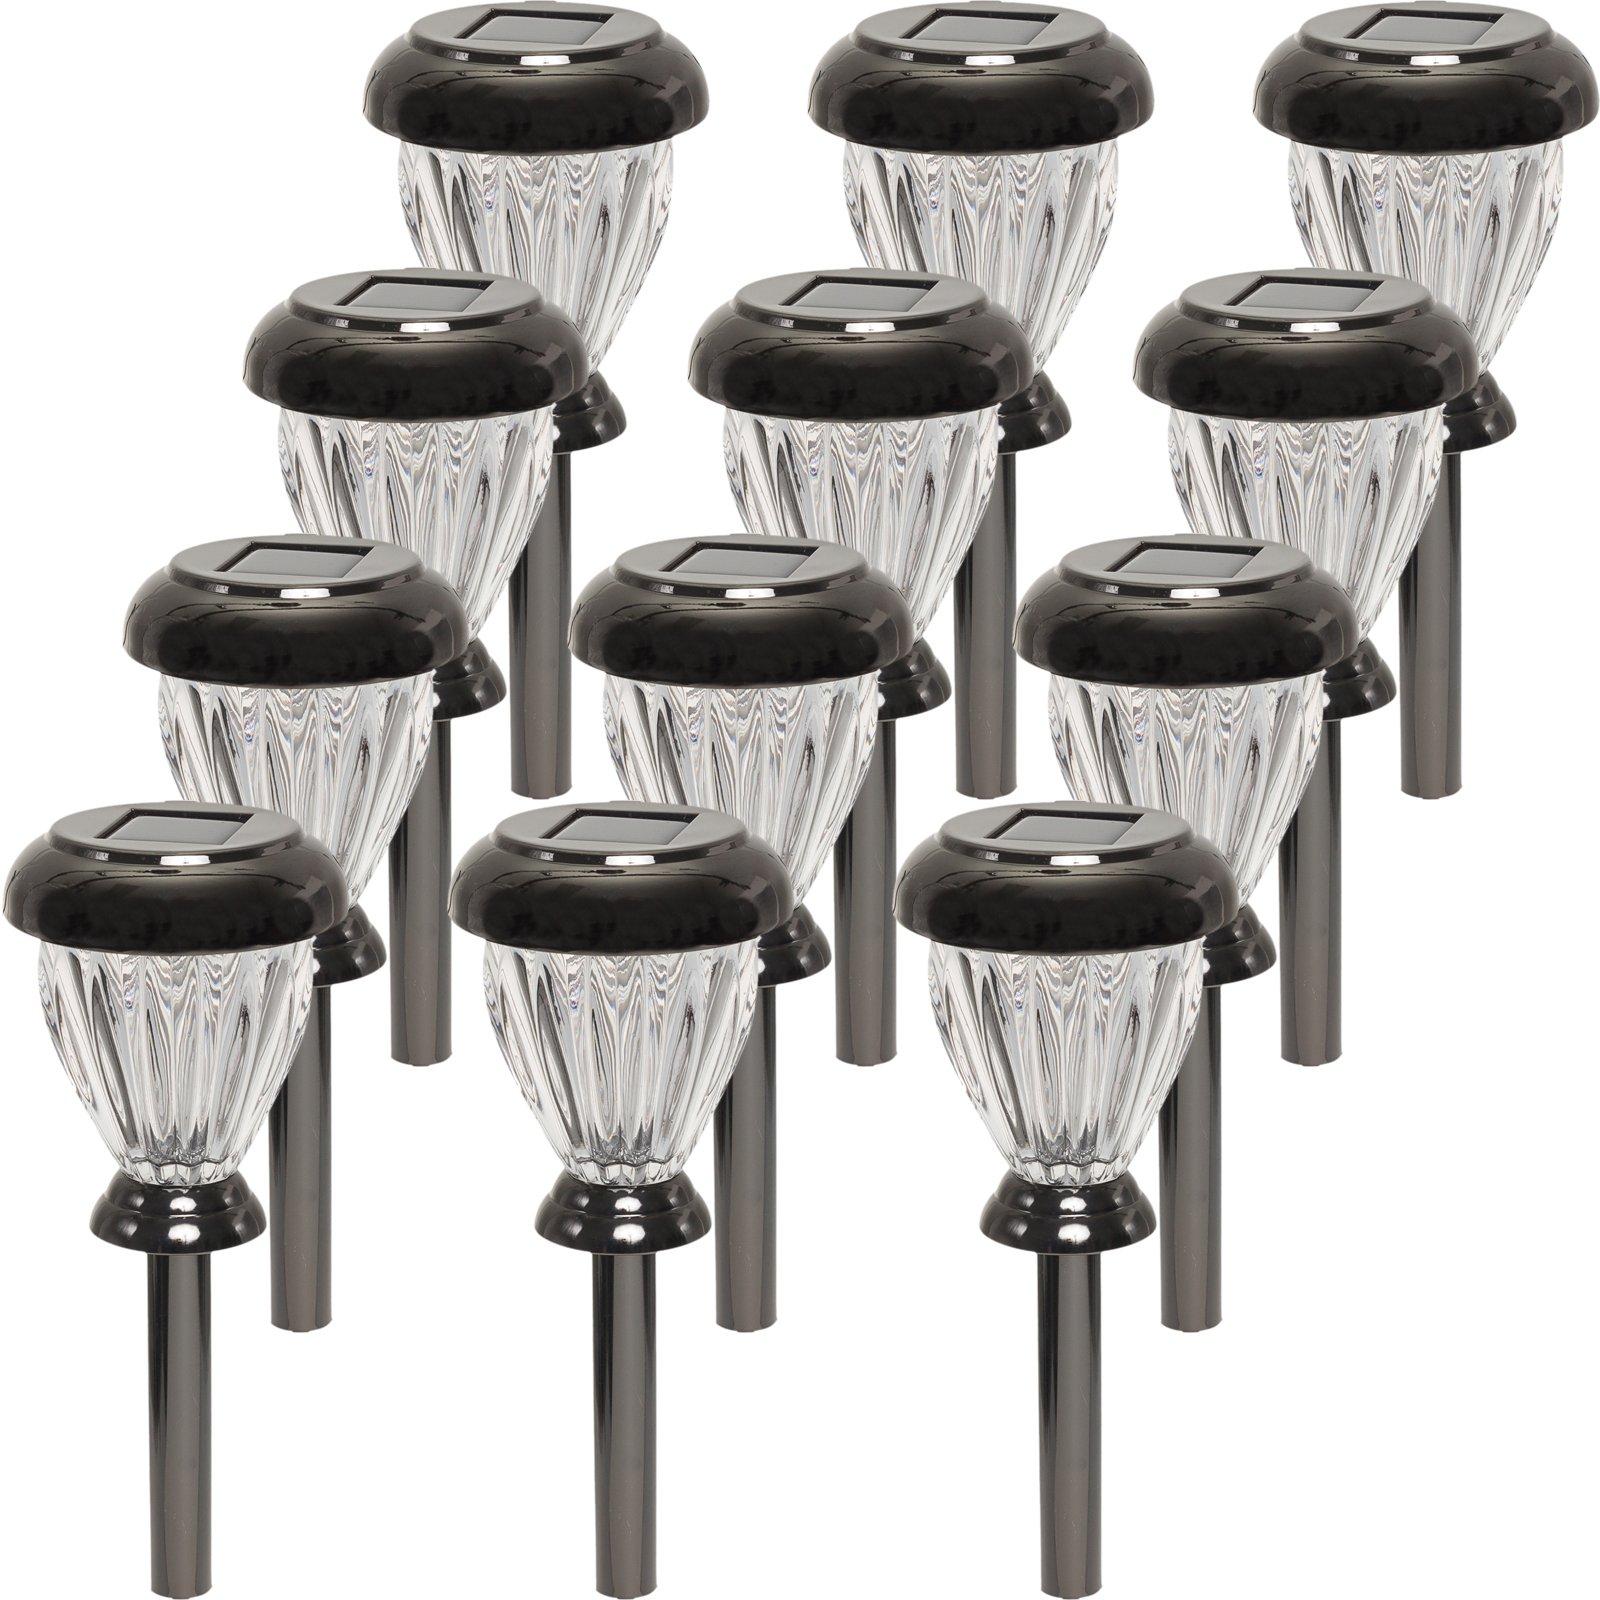 GreenLighting Nickel Plated Classic LED Solar Path Light (Black, 12 Pack)